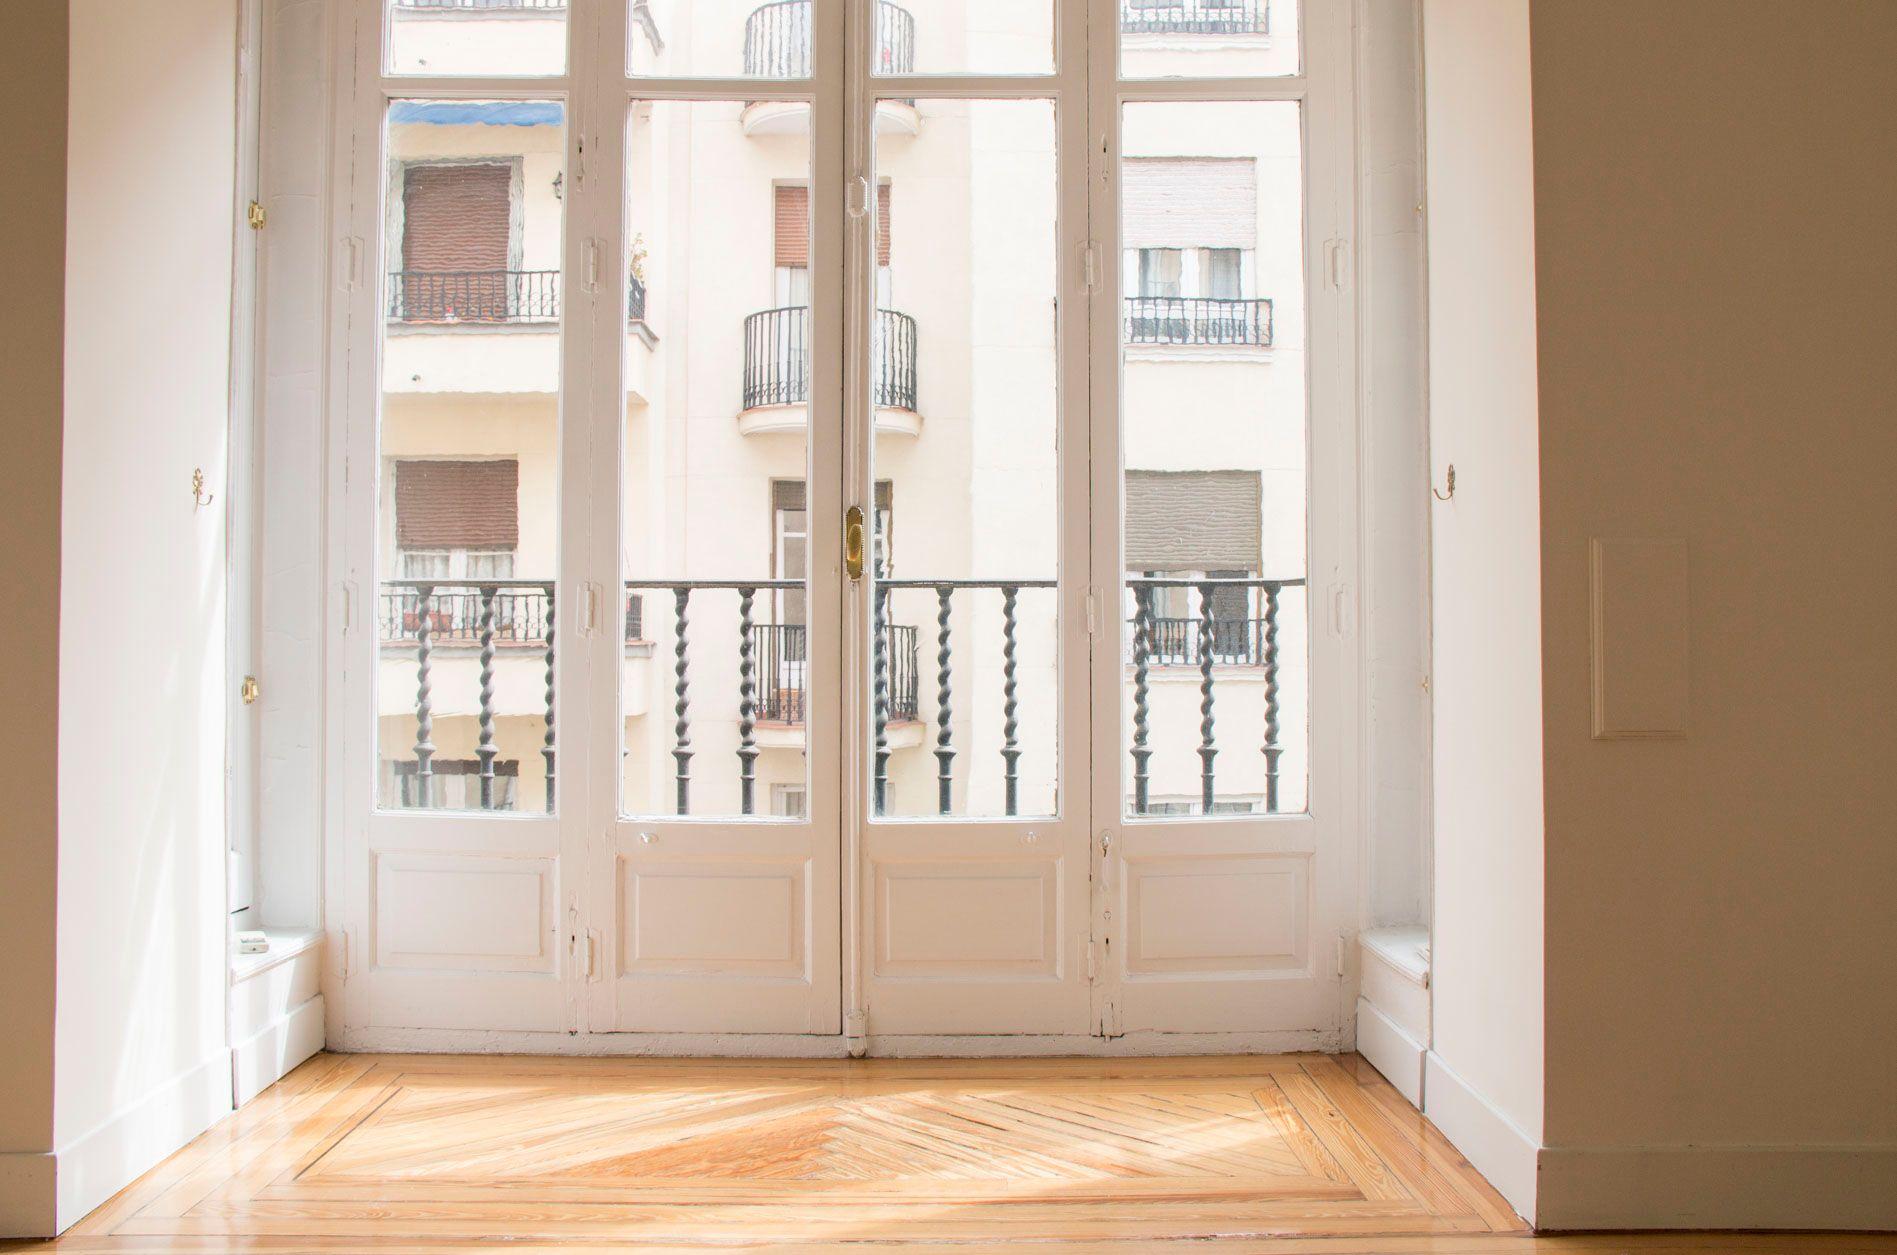 Oficina en Madrid, alquiler